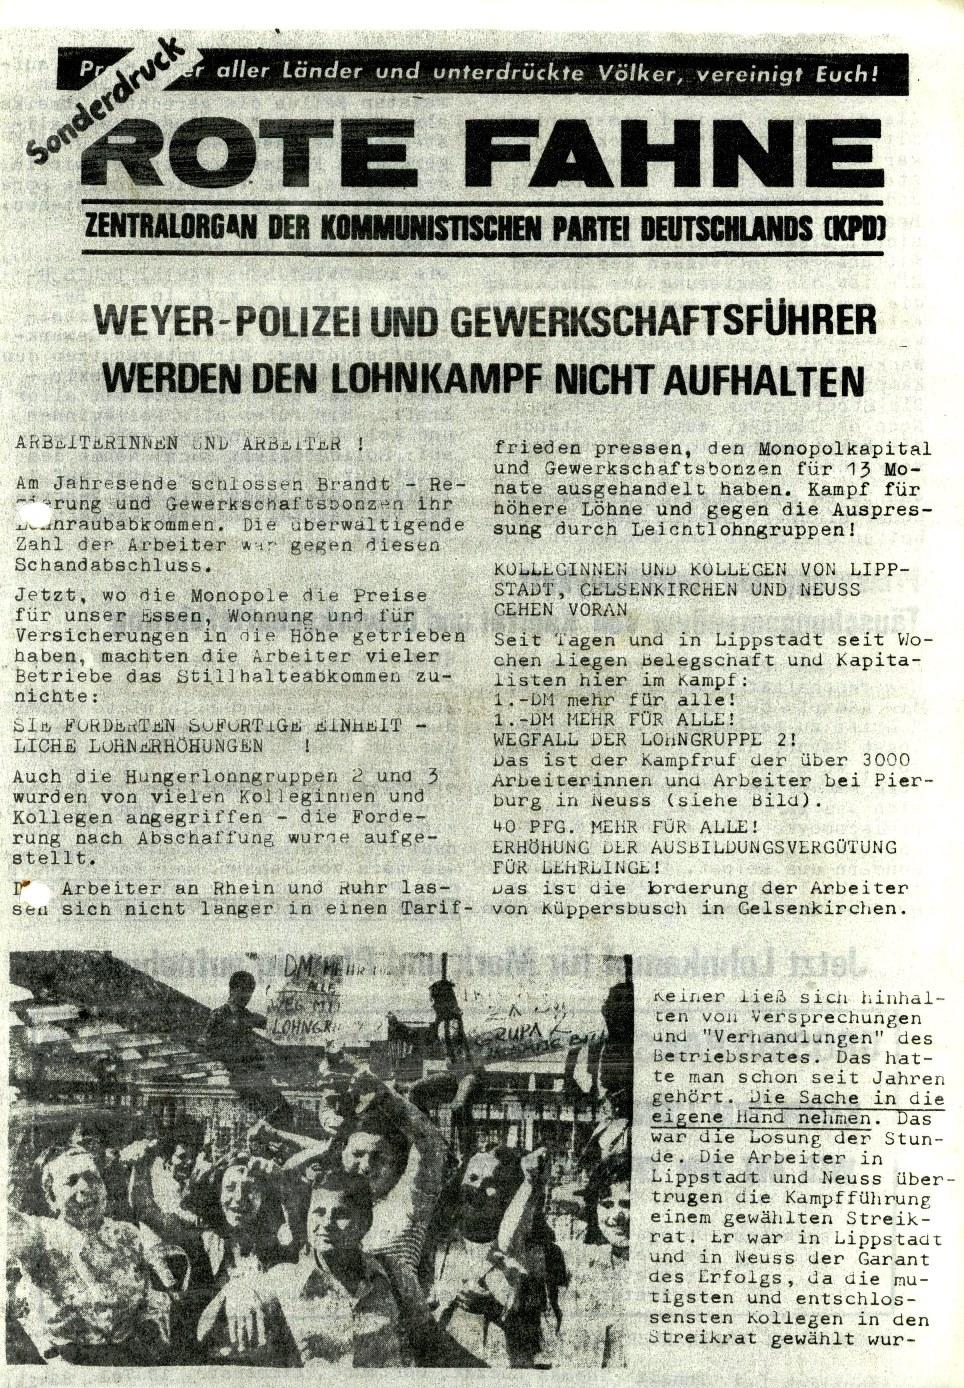 Rote_Fahne_1973_Sonderdruck_01